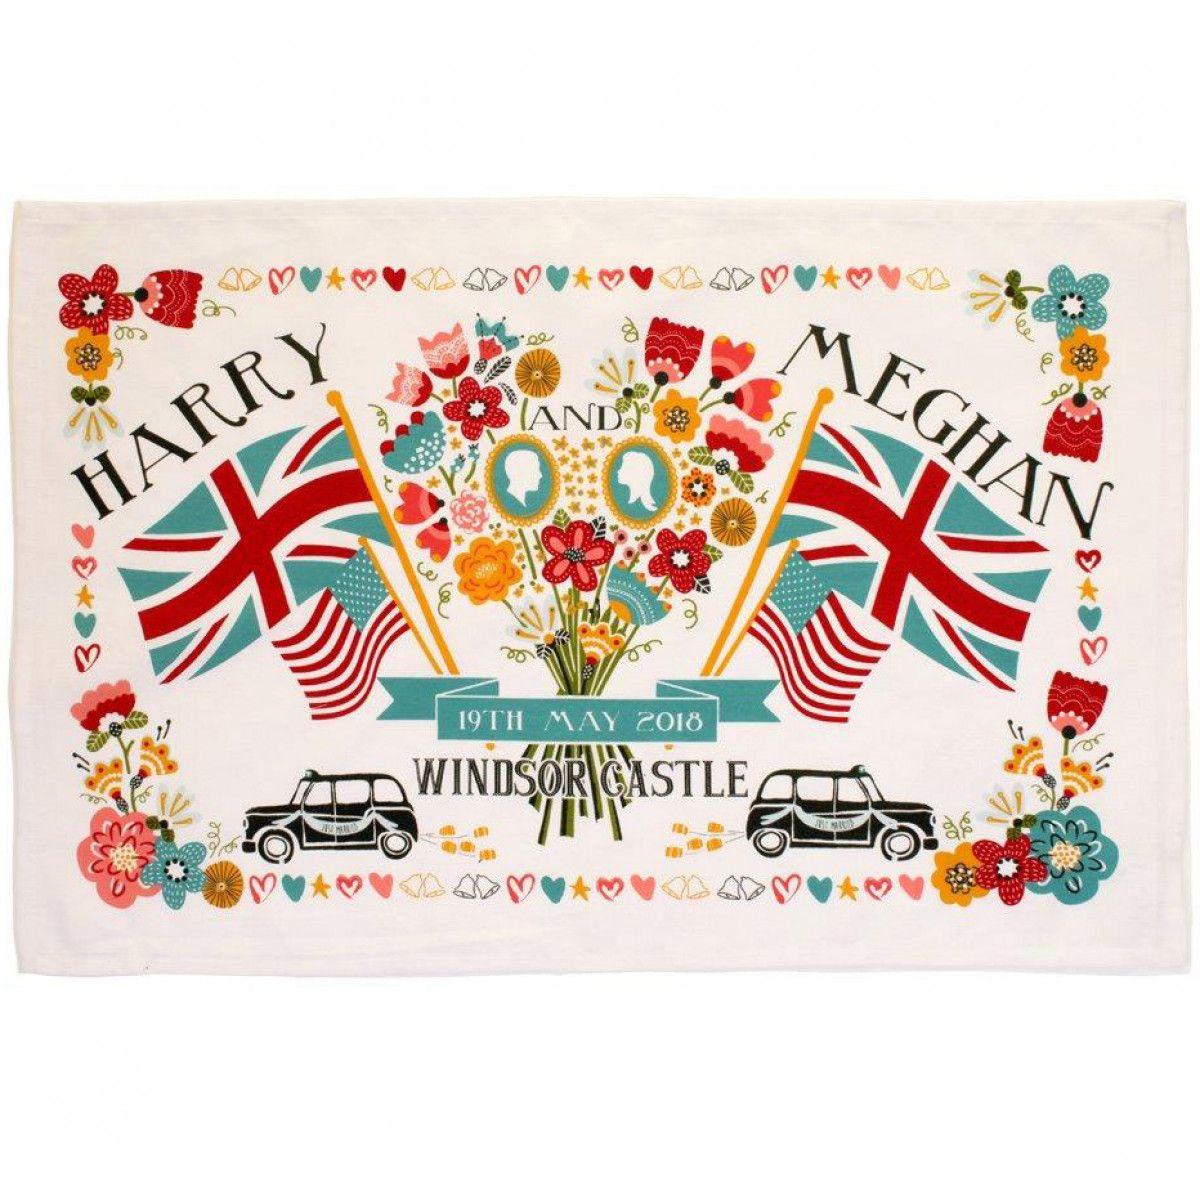 Royal Wedding Tea Towel Flags & Flowers Kitchen